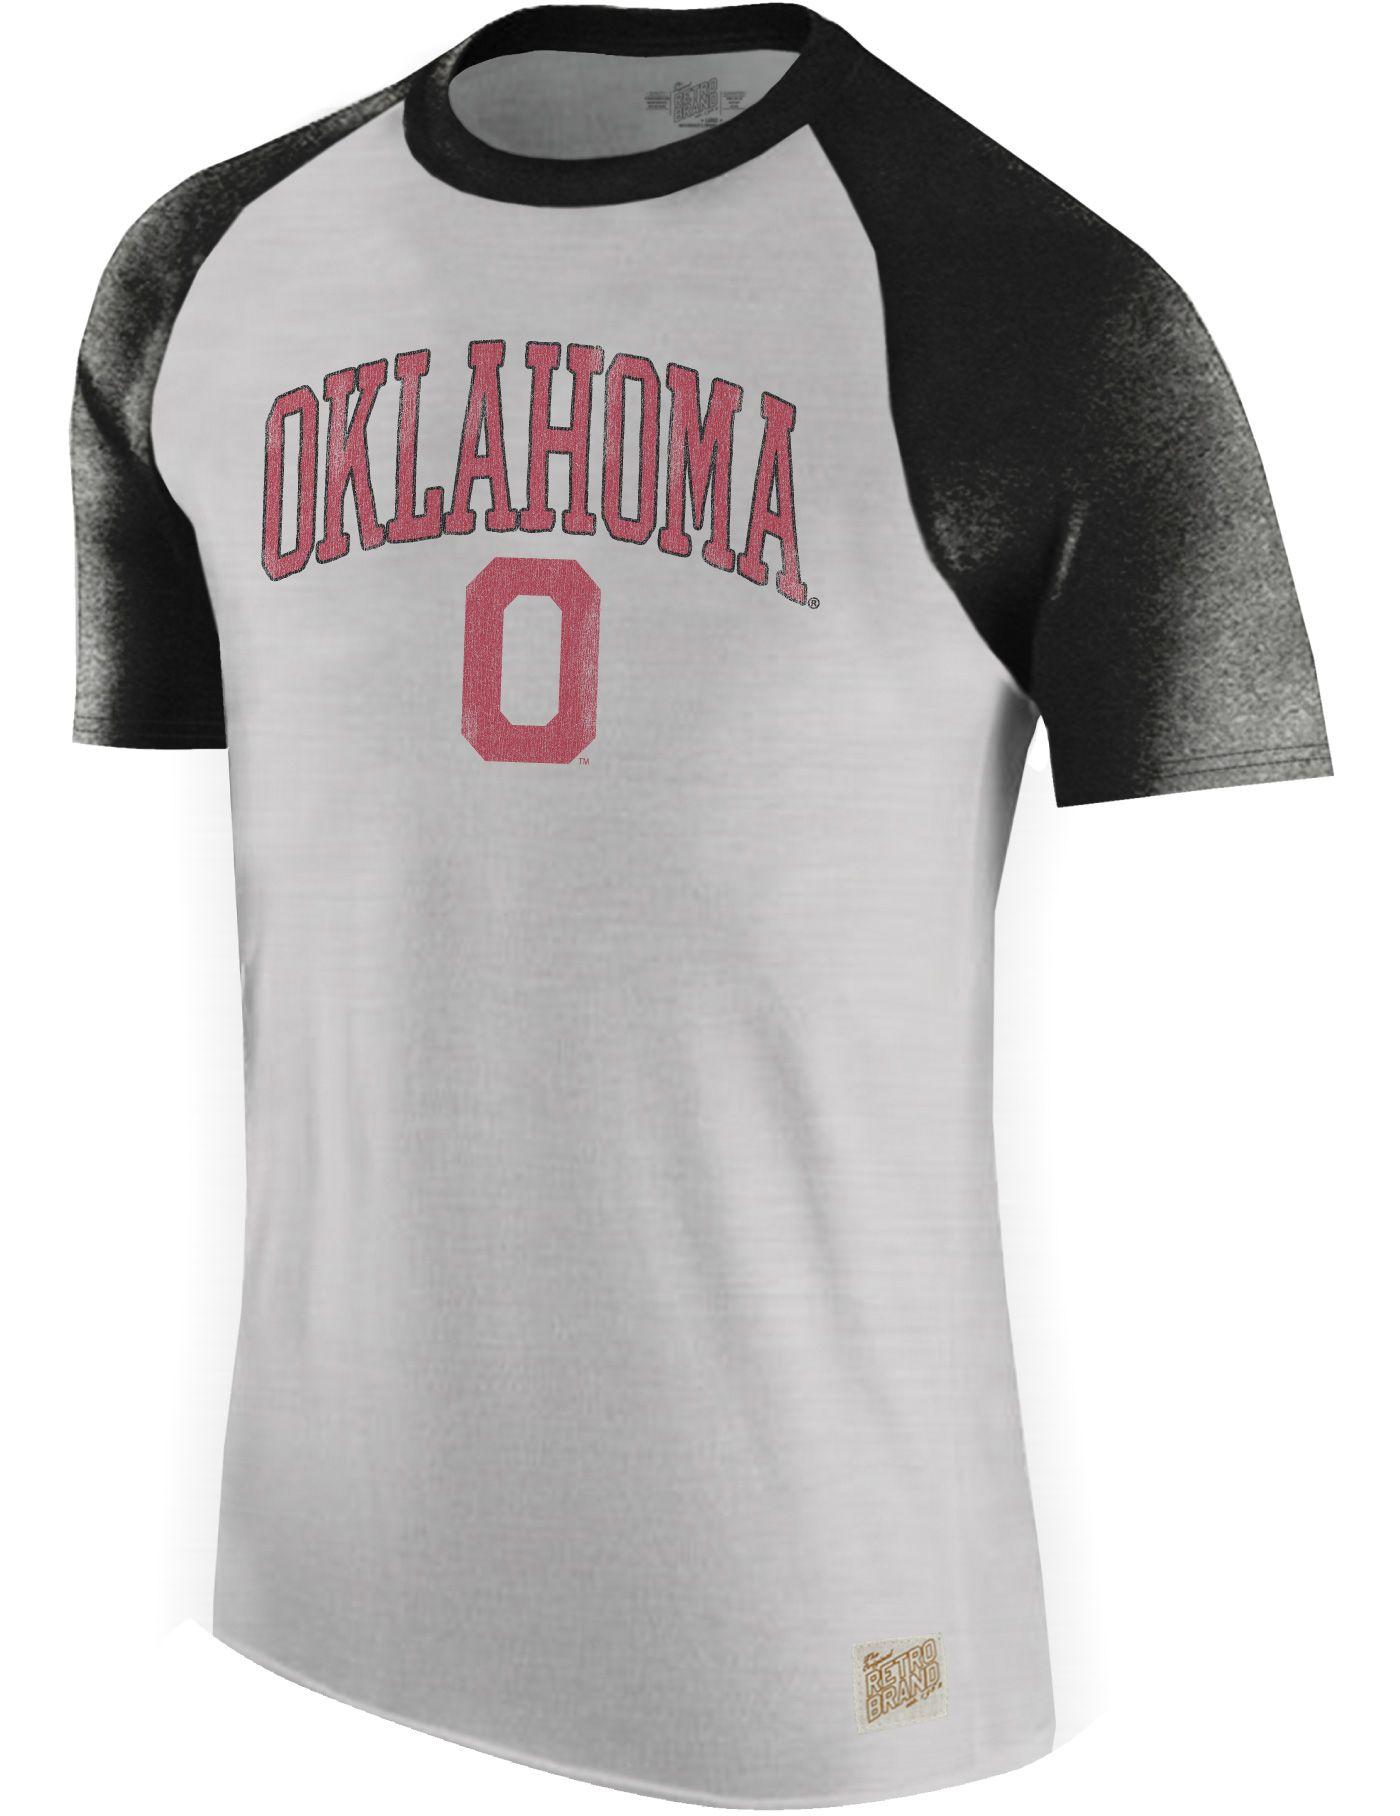 Original Retro Brand Men's Oklahoma Sooners Grey/Black Raglan T-Shirt